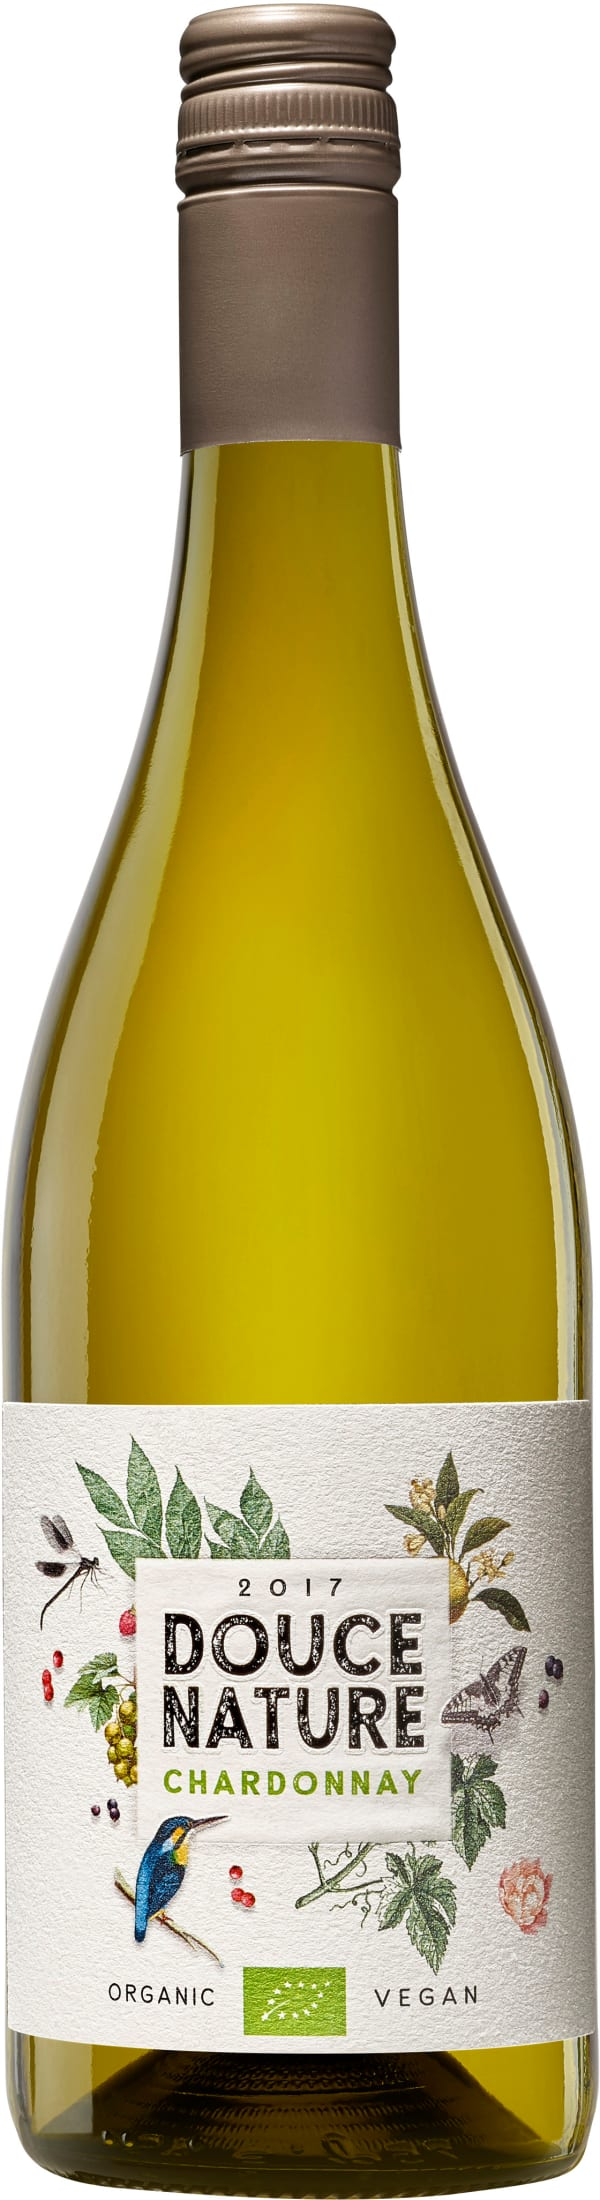 Douce Nature Organic Chardonnay 2017